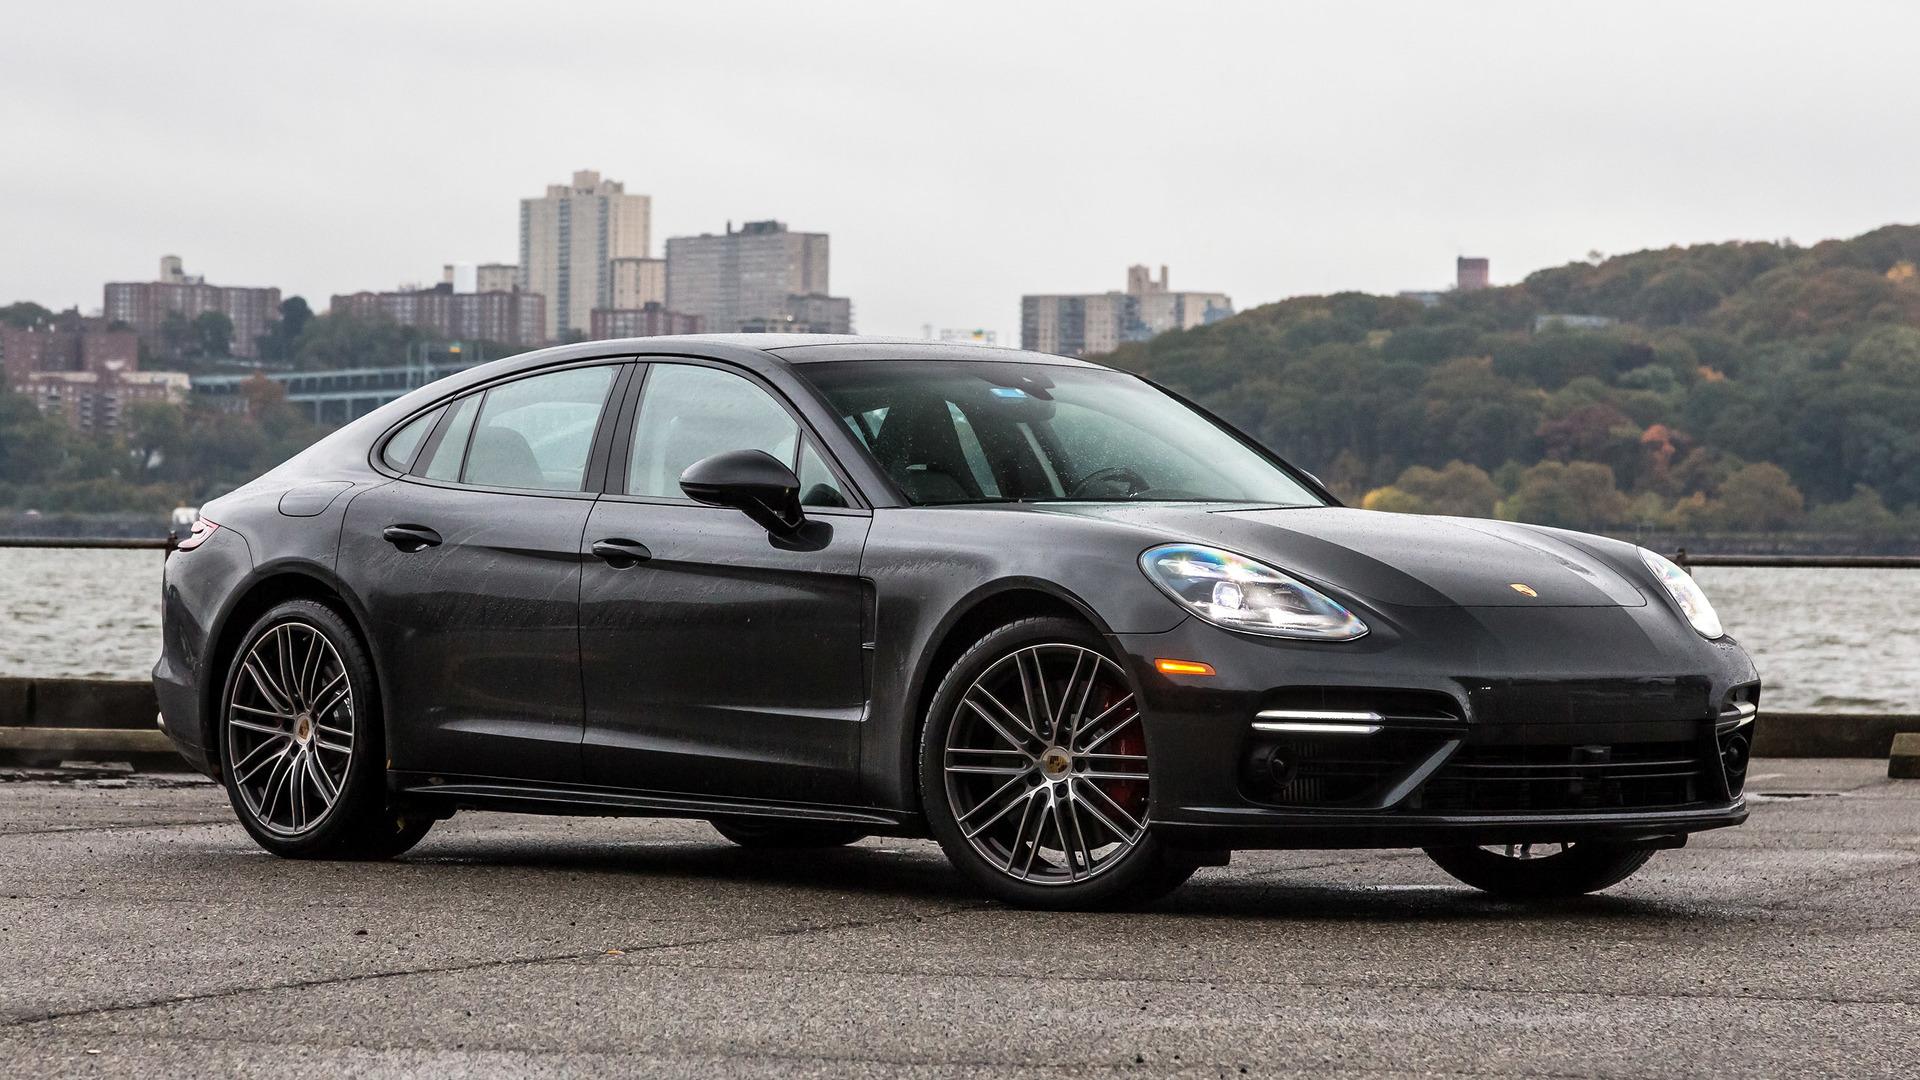 2017 porsche panamera turbo s 2017 2018 best car reviews 2017 2018 - 2017 Porsche Panamera Turbo First Drive When Luxury Four Door Means Fantastic